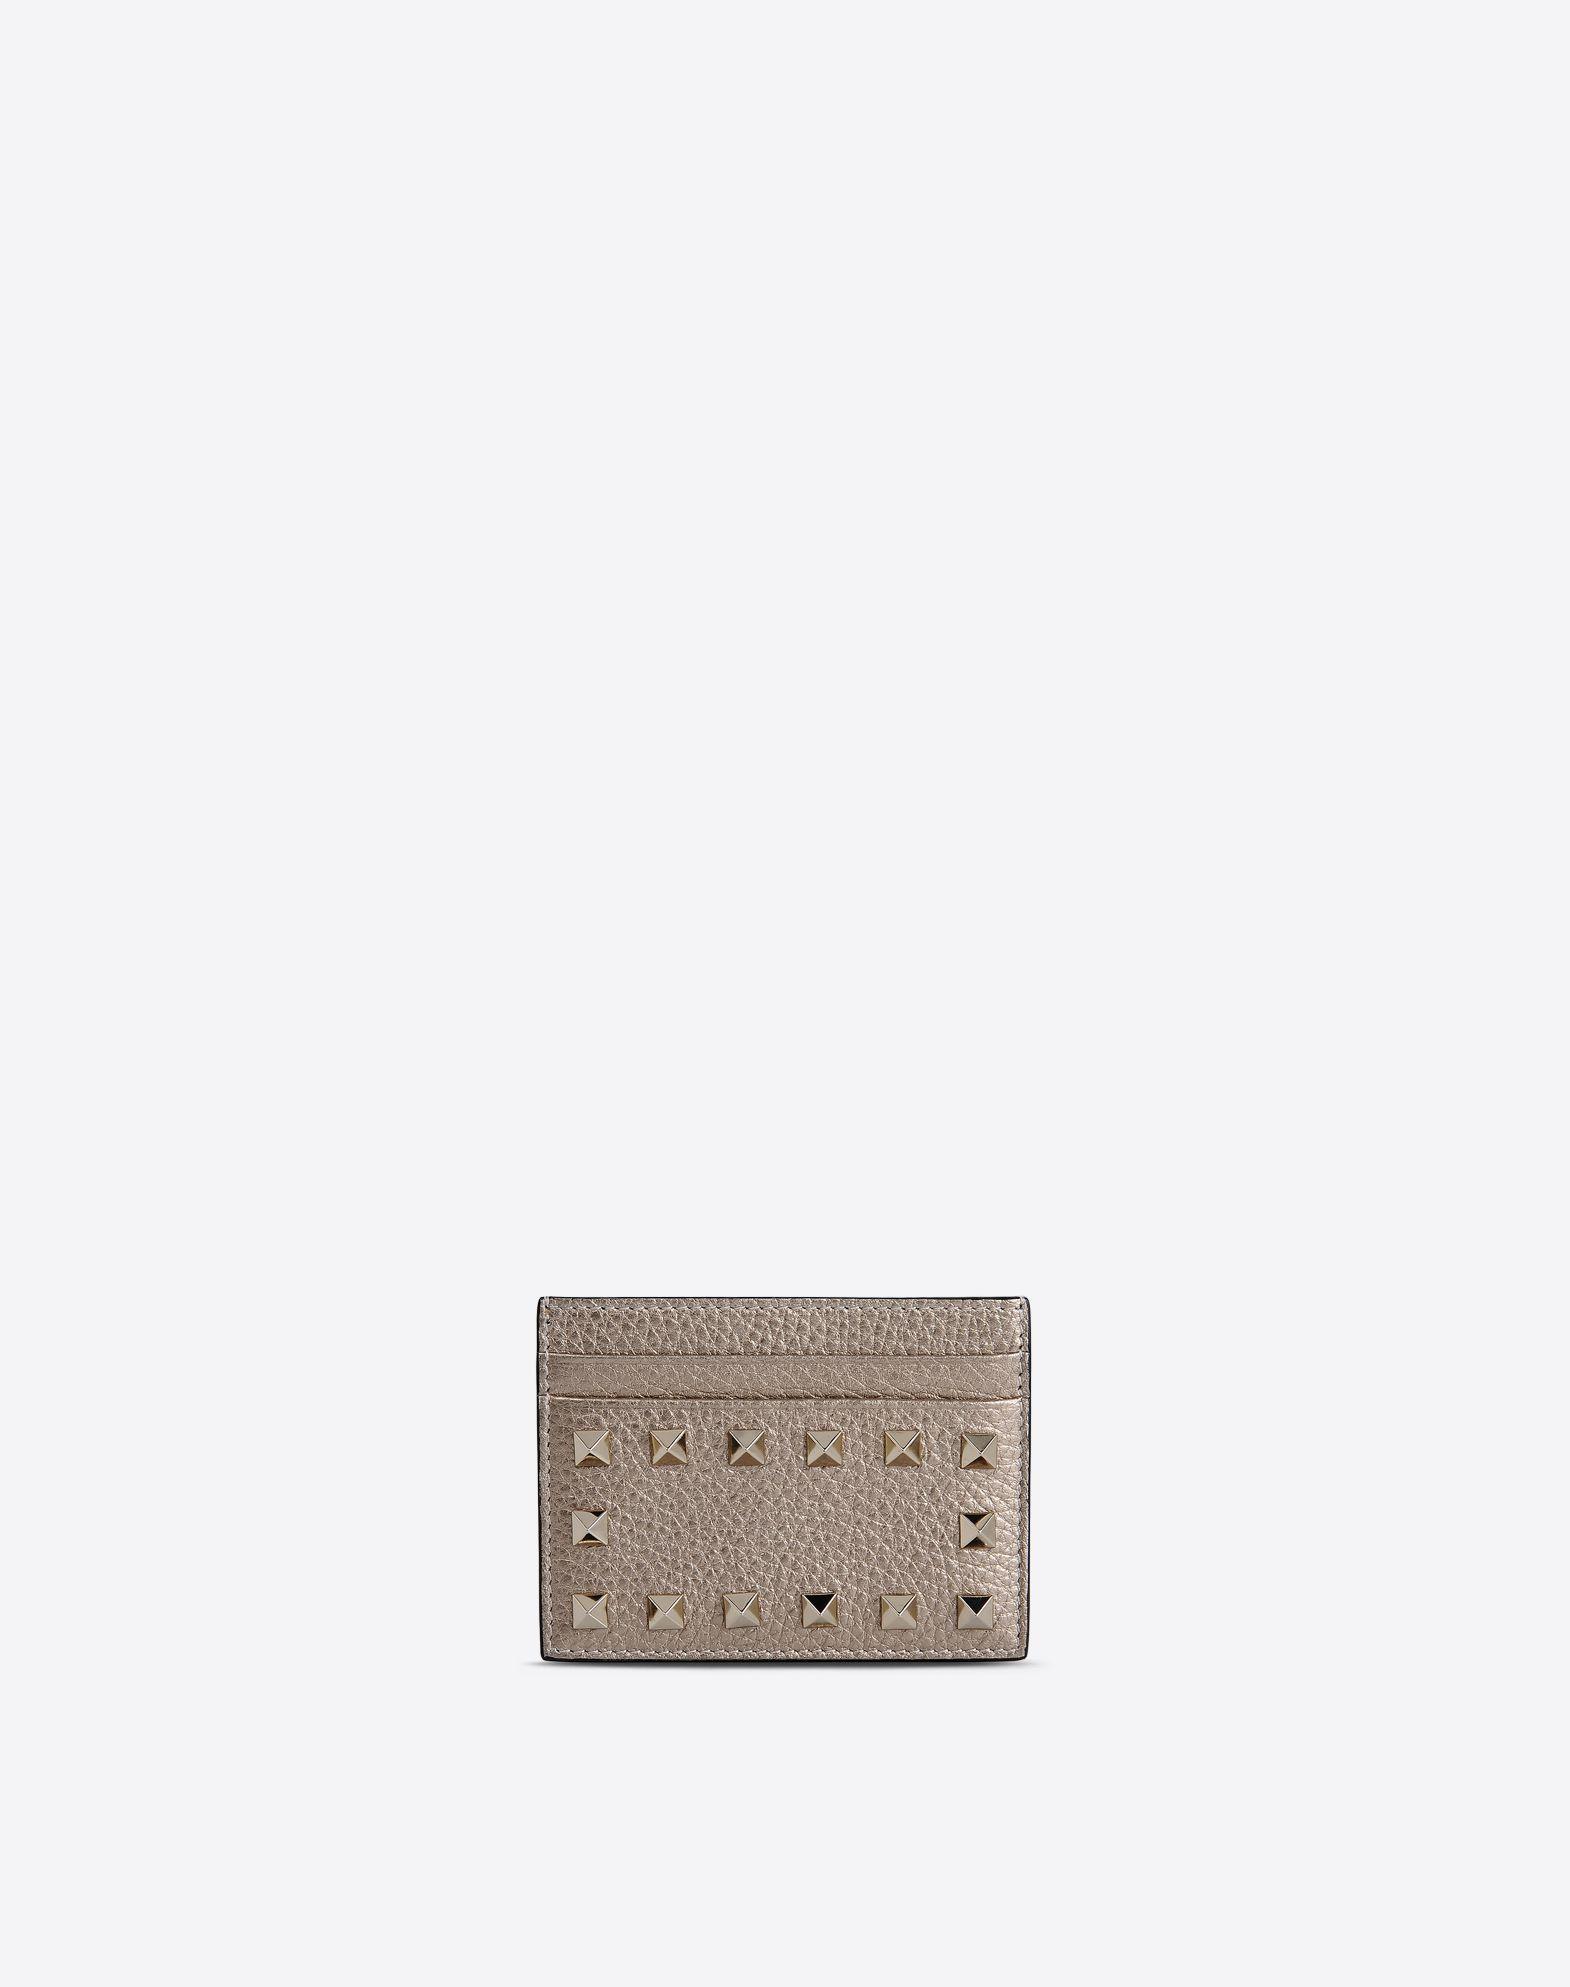 "VALENTINO Valentino Garavani Rockstud credit card holder in metallic Stampa Alce calfskin.  - Platinum-finish studs  - Four card slots and one slit pocket  - Dimensions: W10xH8 cm/W4xH3""  - Made in Italy. 46426601sr"